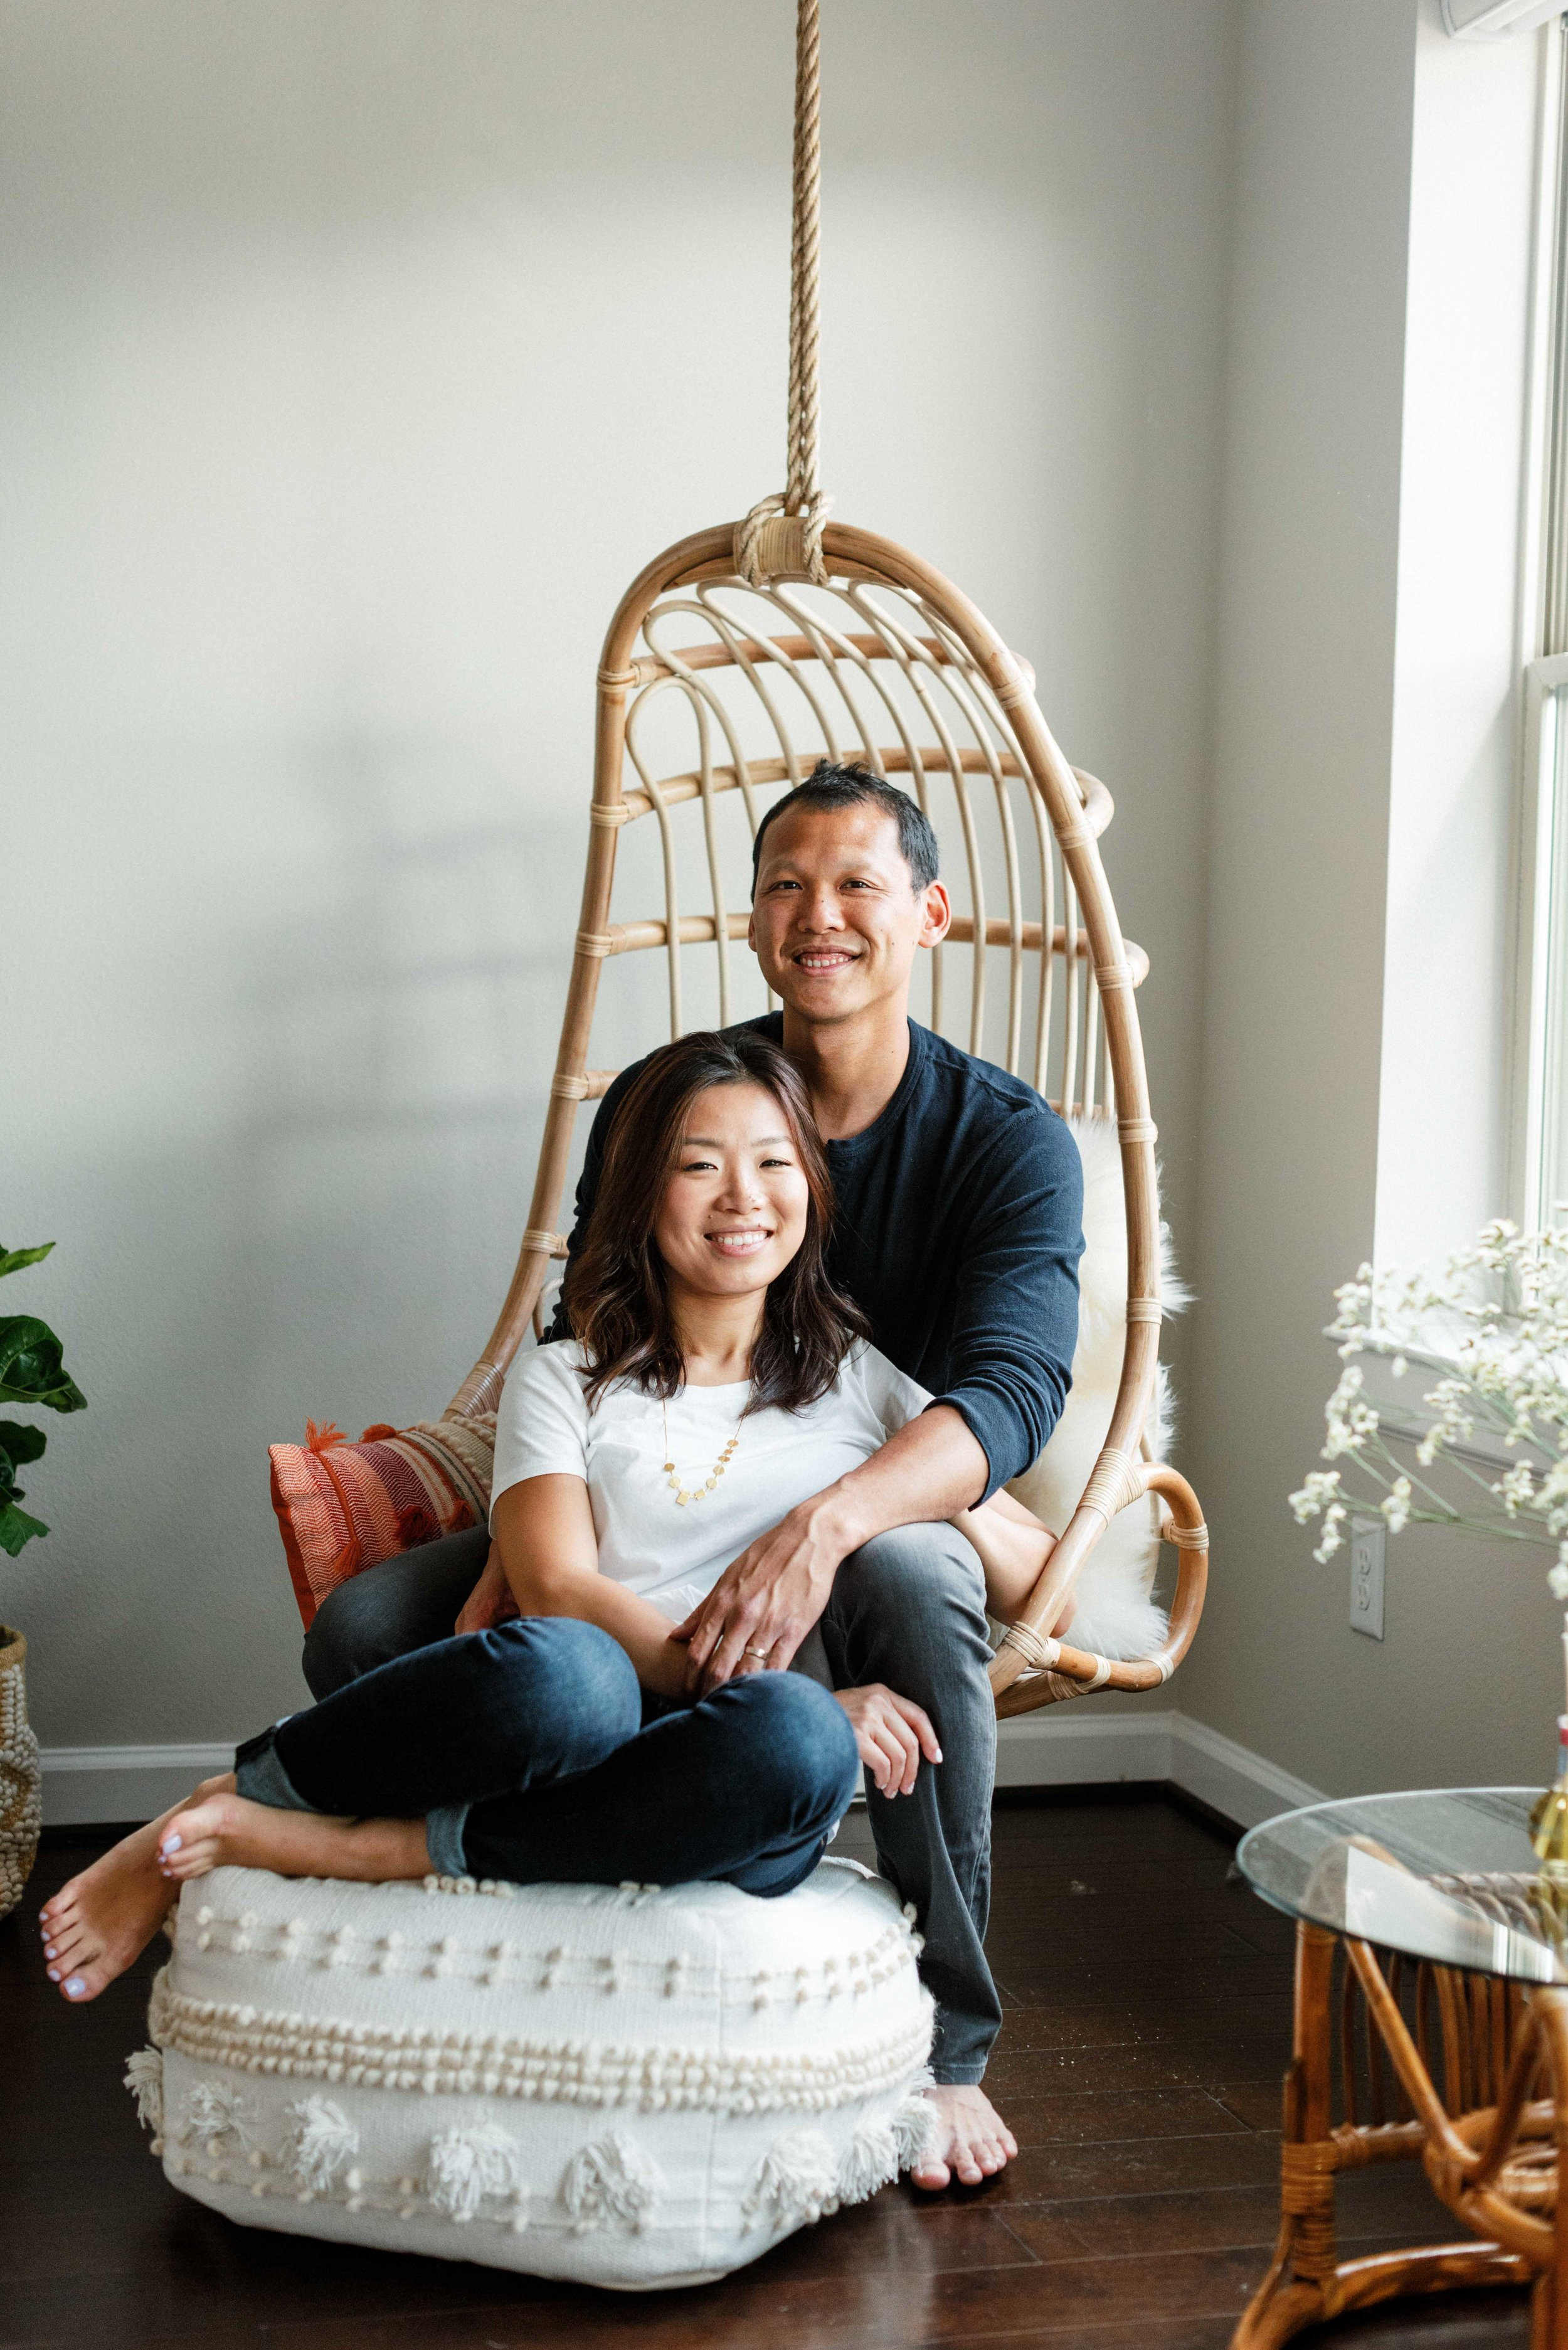 Houston-Fine-Art-Film-Destination-Wedding-Photographer-Top-Best-Luxury-Josh-Dana-Fernandez-Photographer-Austin-Texas-35.jpg